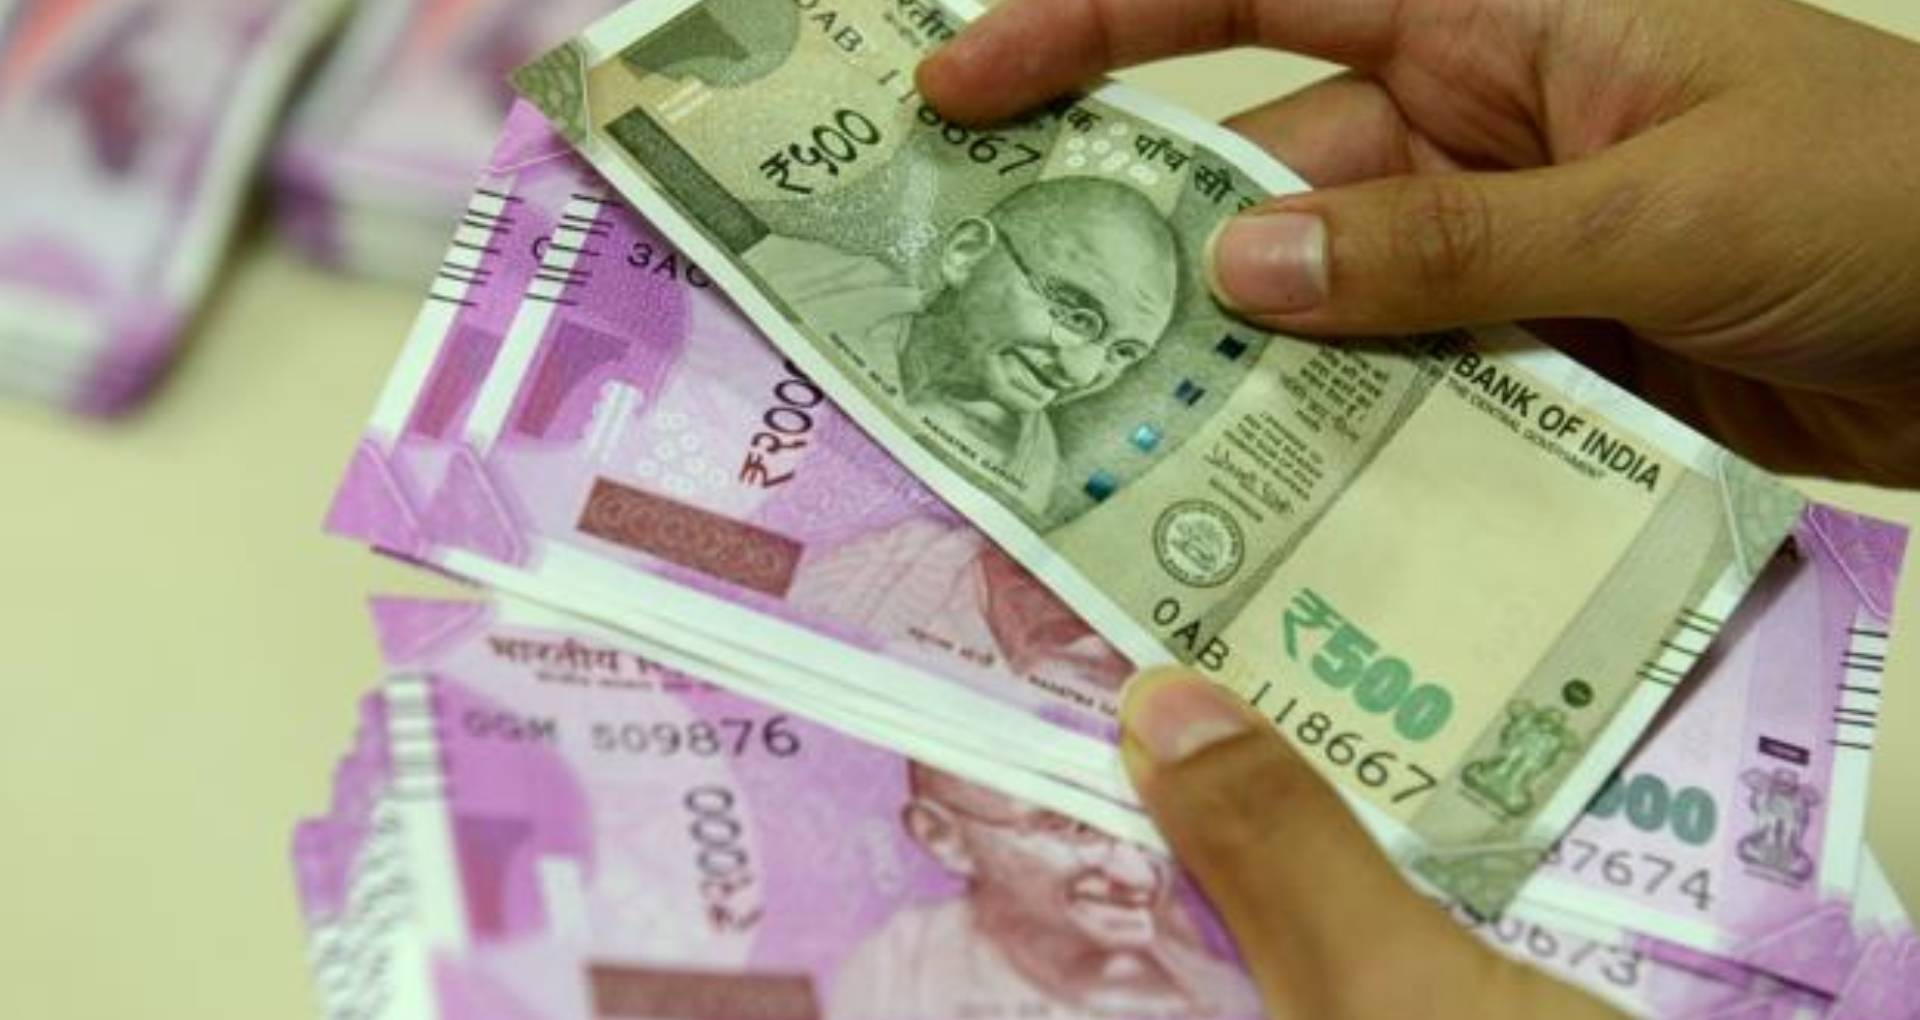 Kerala Win Win W-529 Lottery Result Out: केरल लॉटरी विन विन का रिजल्ट हुआ जारी, इतने लोग बन गए घर बैठे लखपति